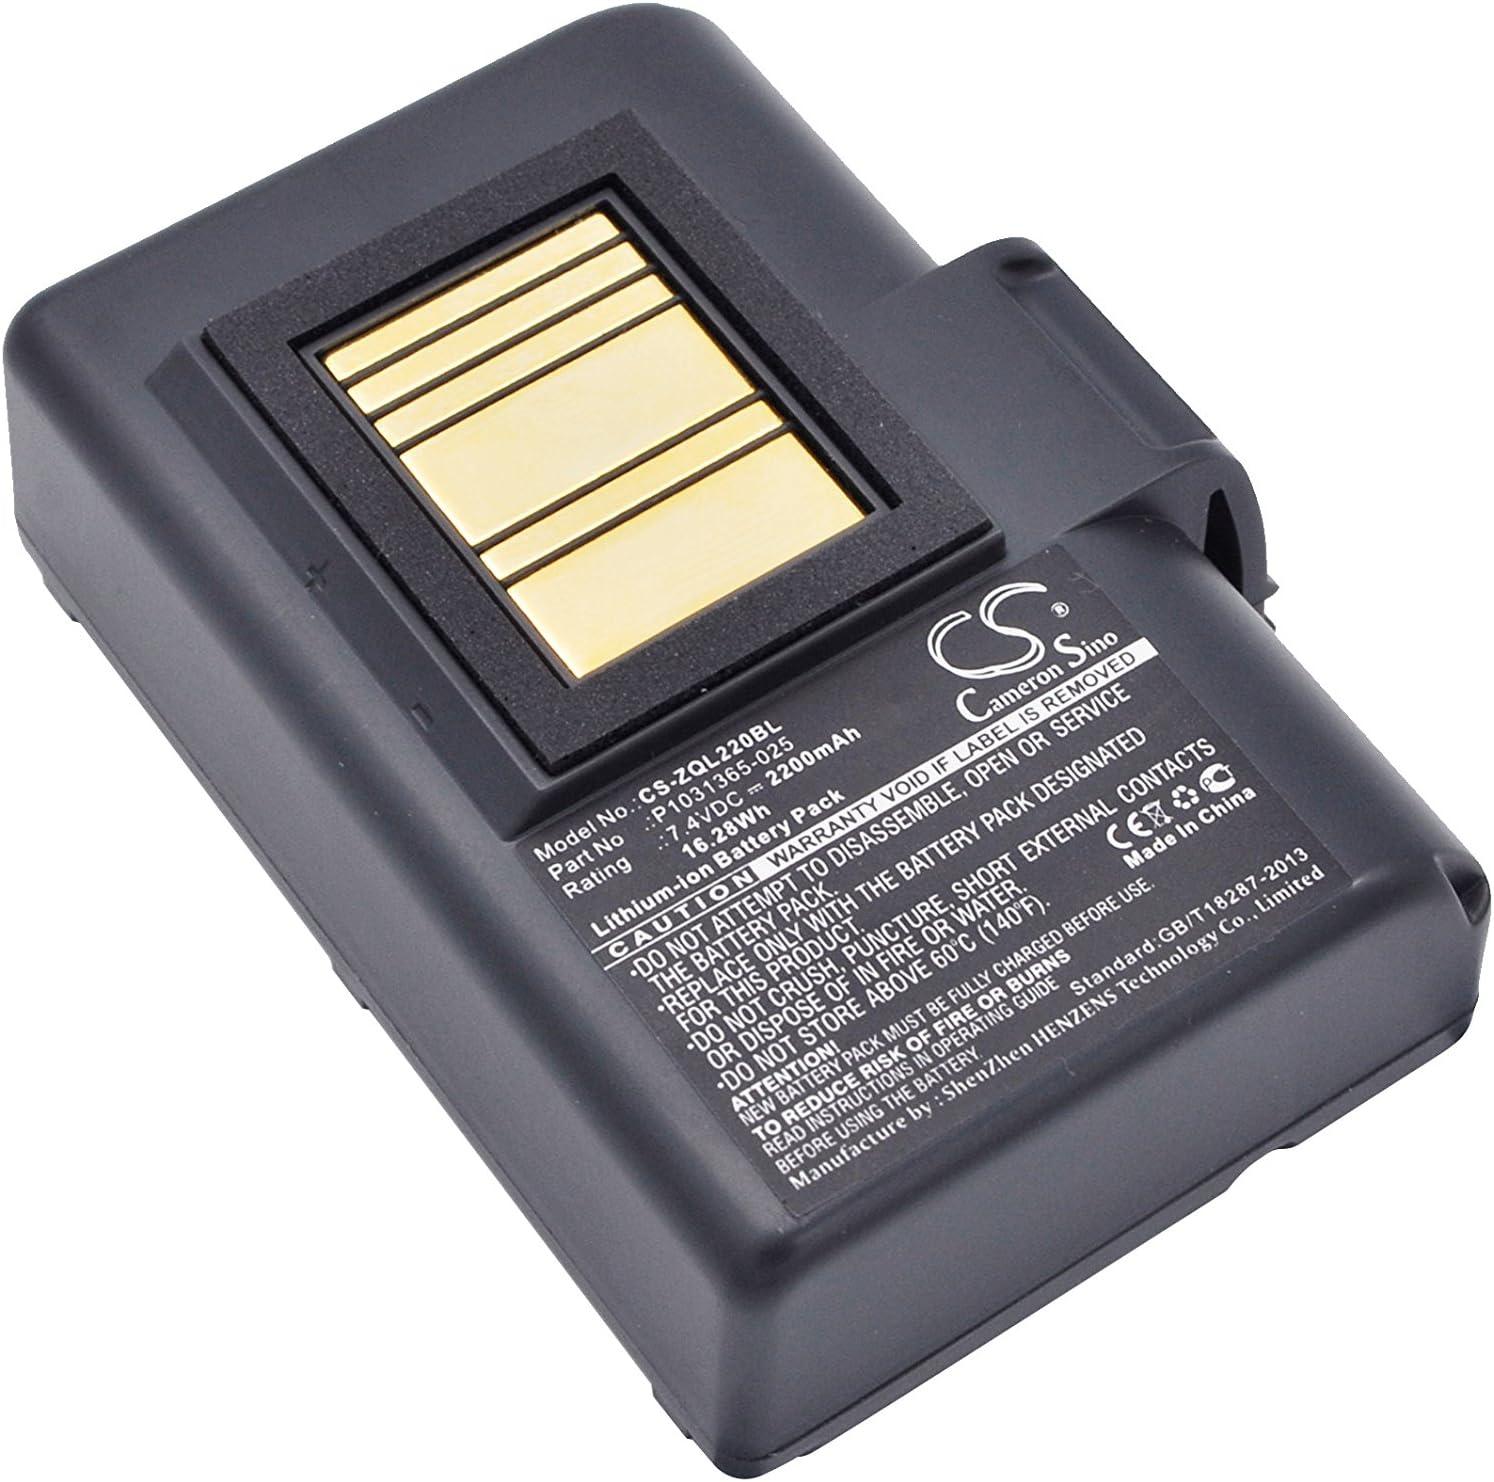 Replacement Battery for Zebra QLN320 QLN220 ZQ520 ZQ500 ZQ510 P1023901 P1023901-LF P1031365-025